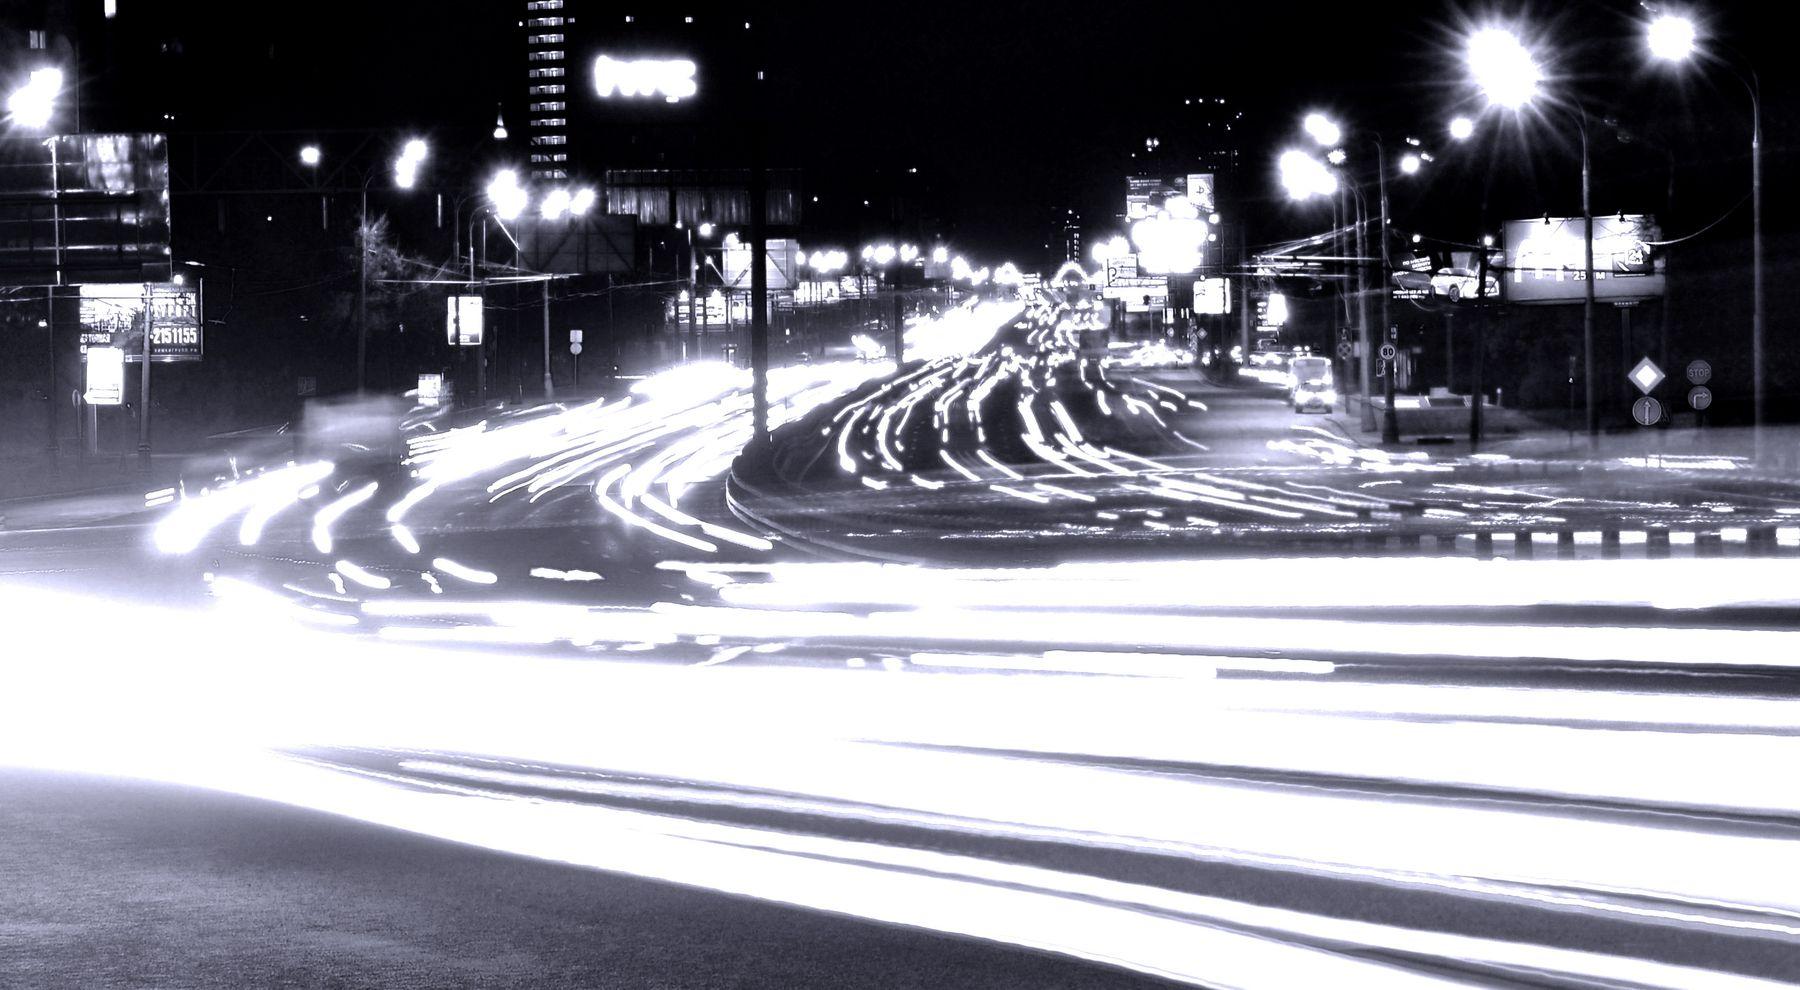 Трансполис город свет транспорт огни трасса